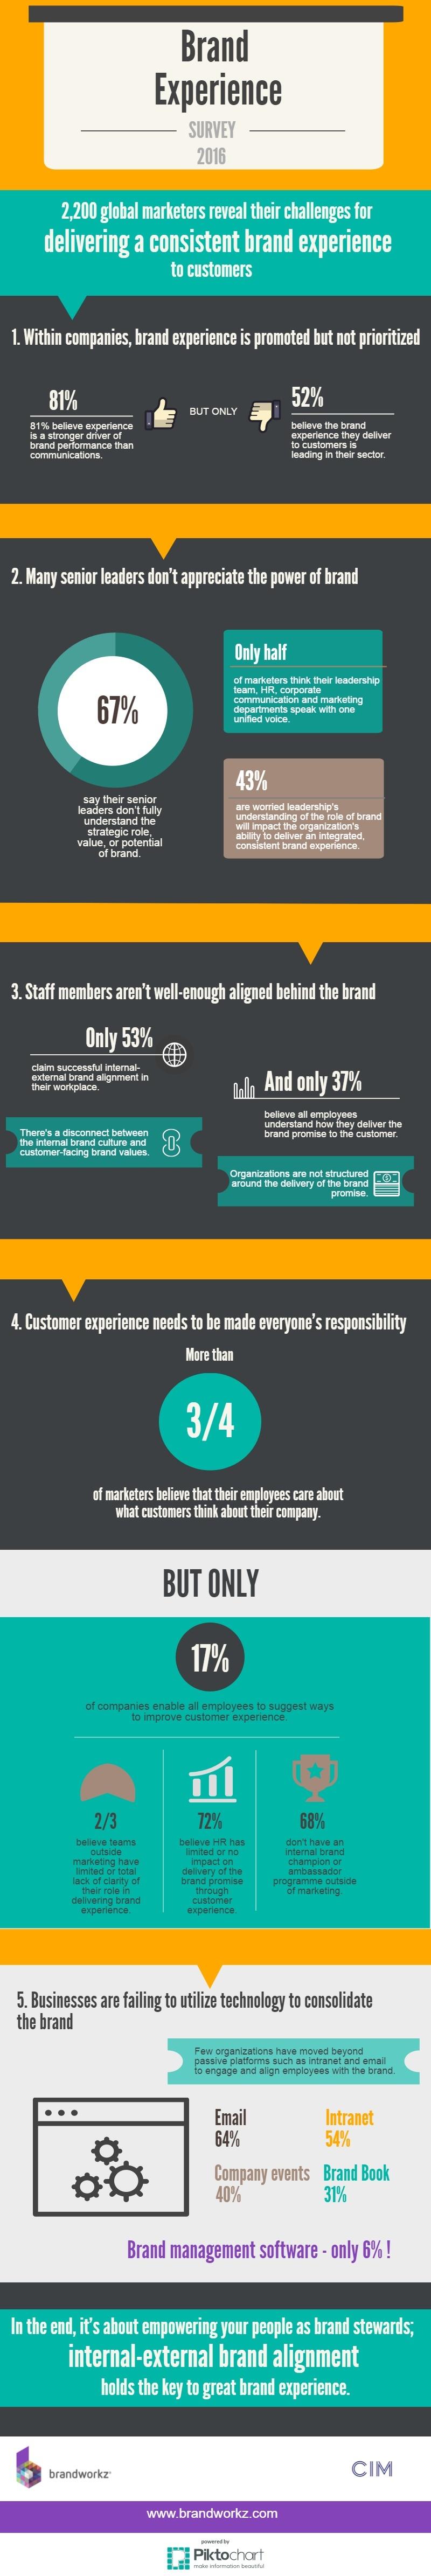 brand-experience-infographic.jpg